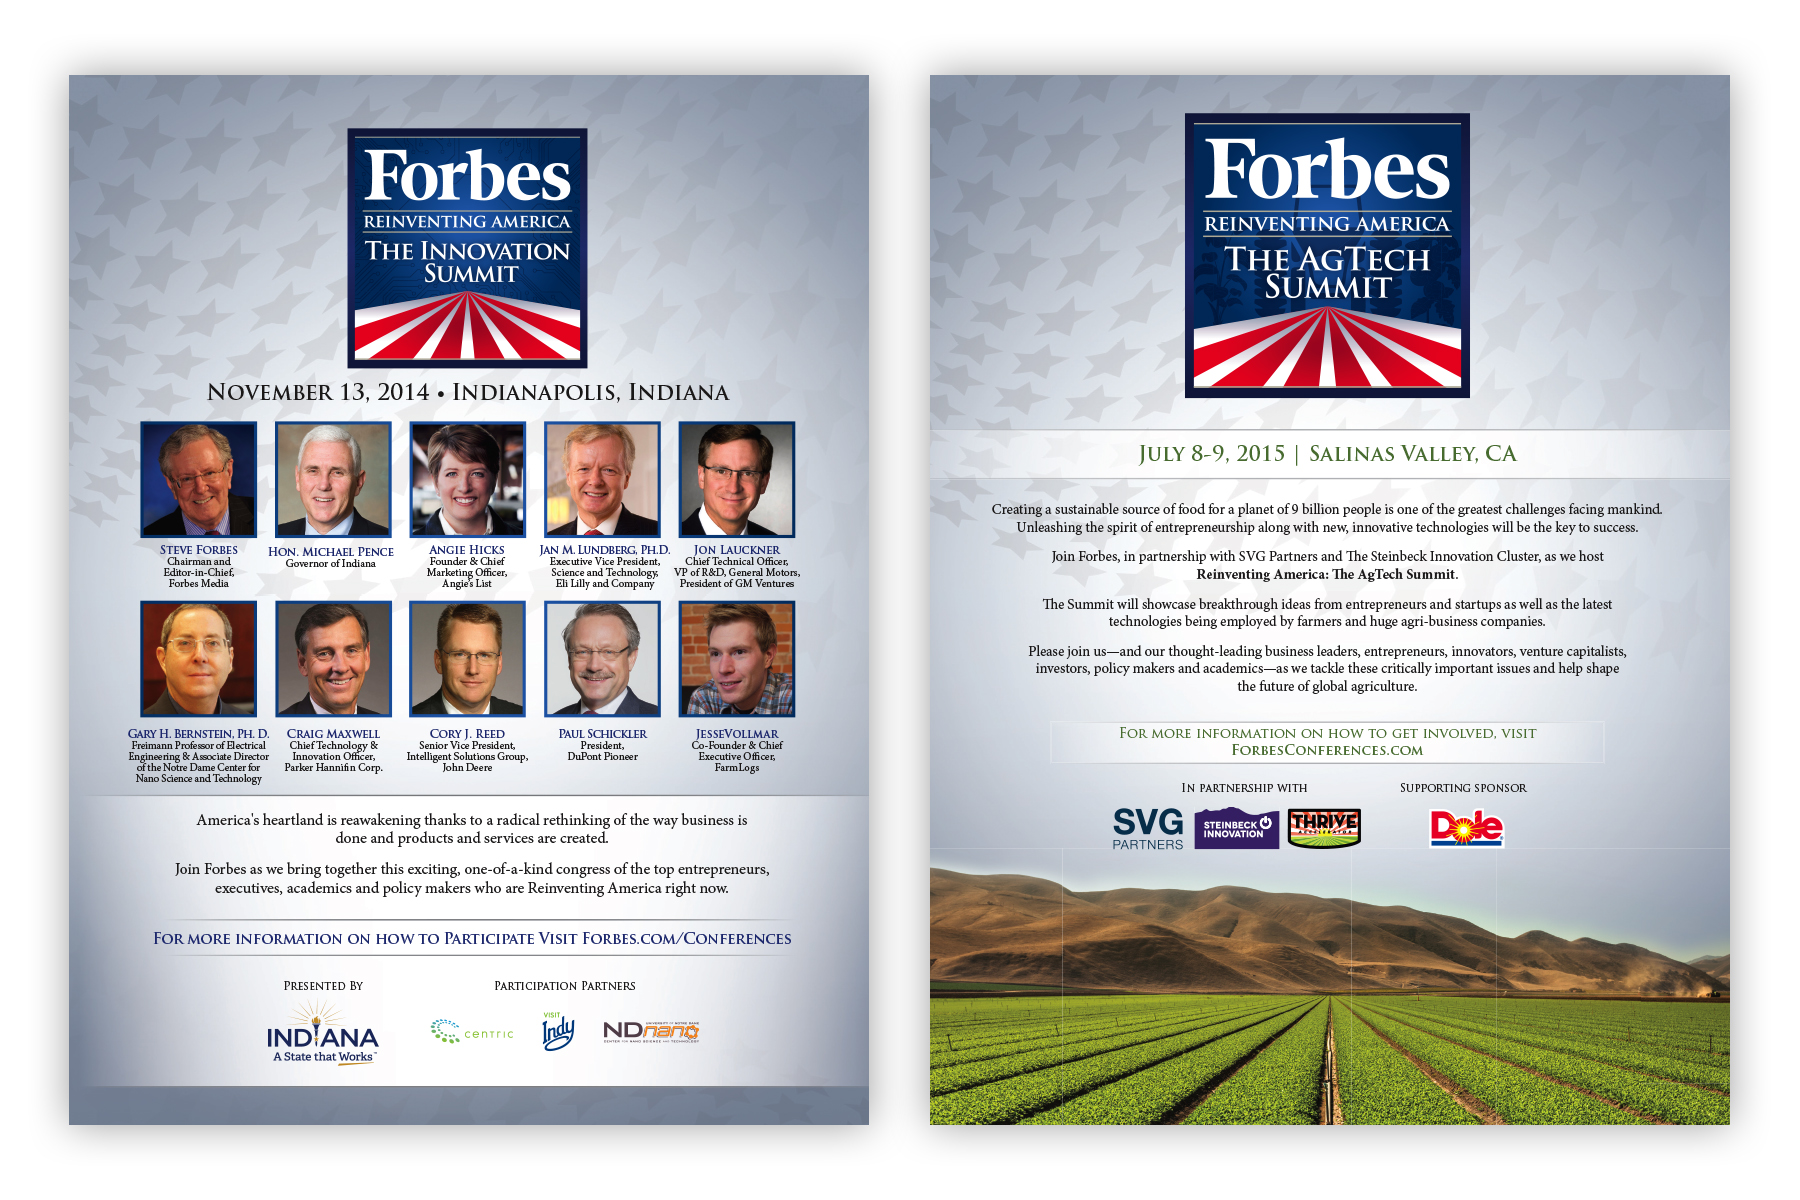 Forbes Reinventing America Summit Series